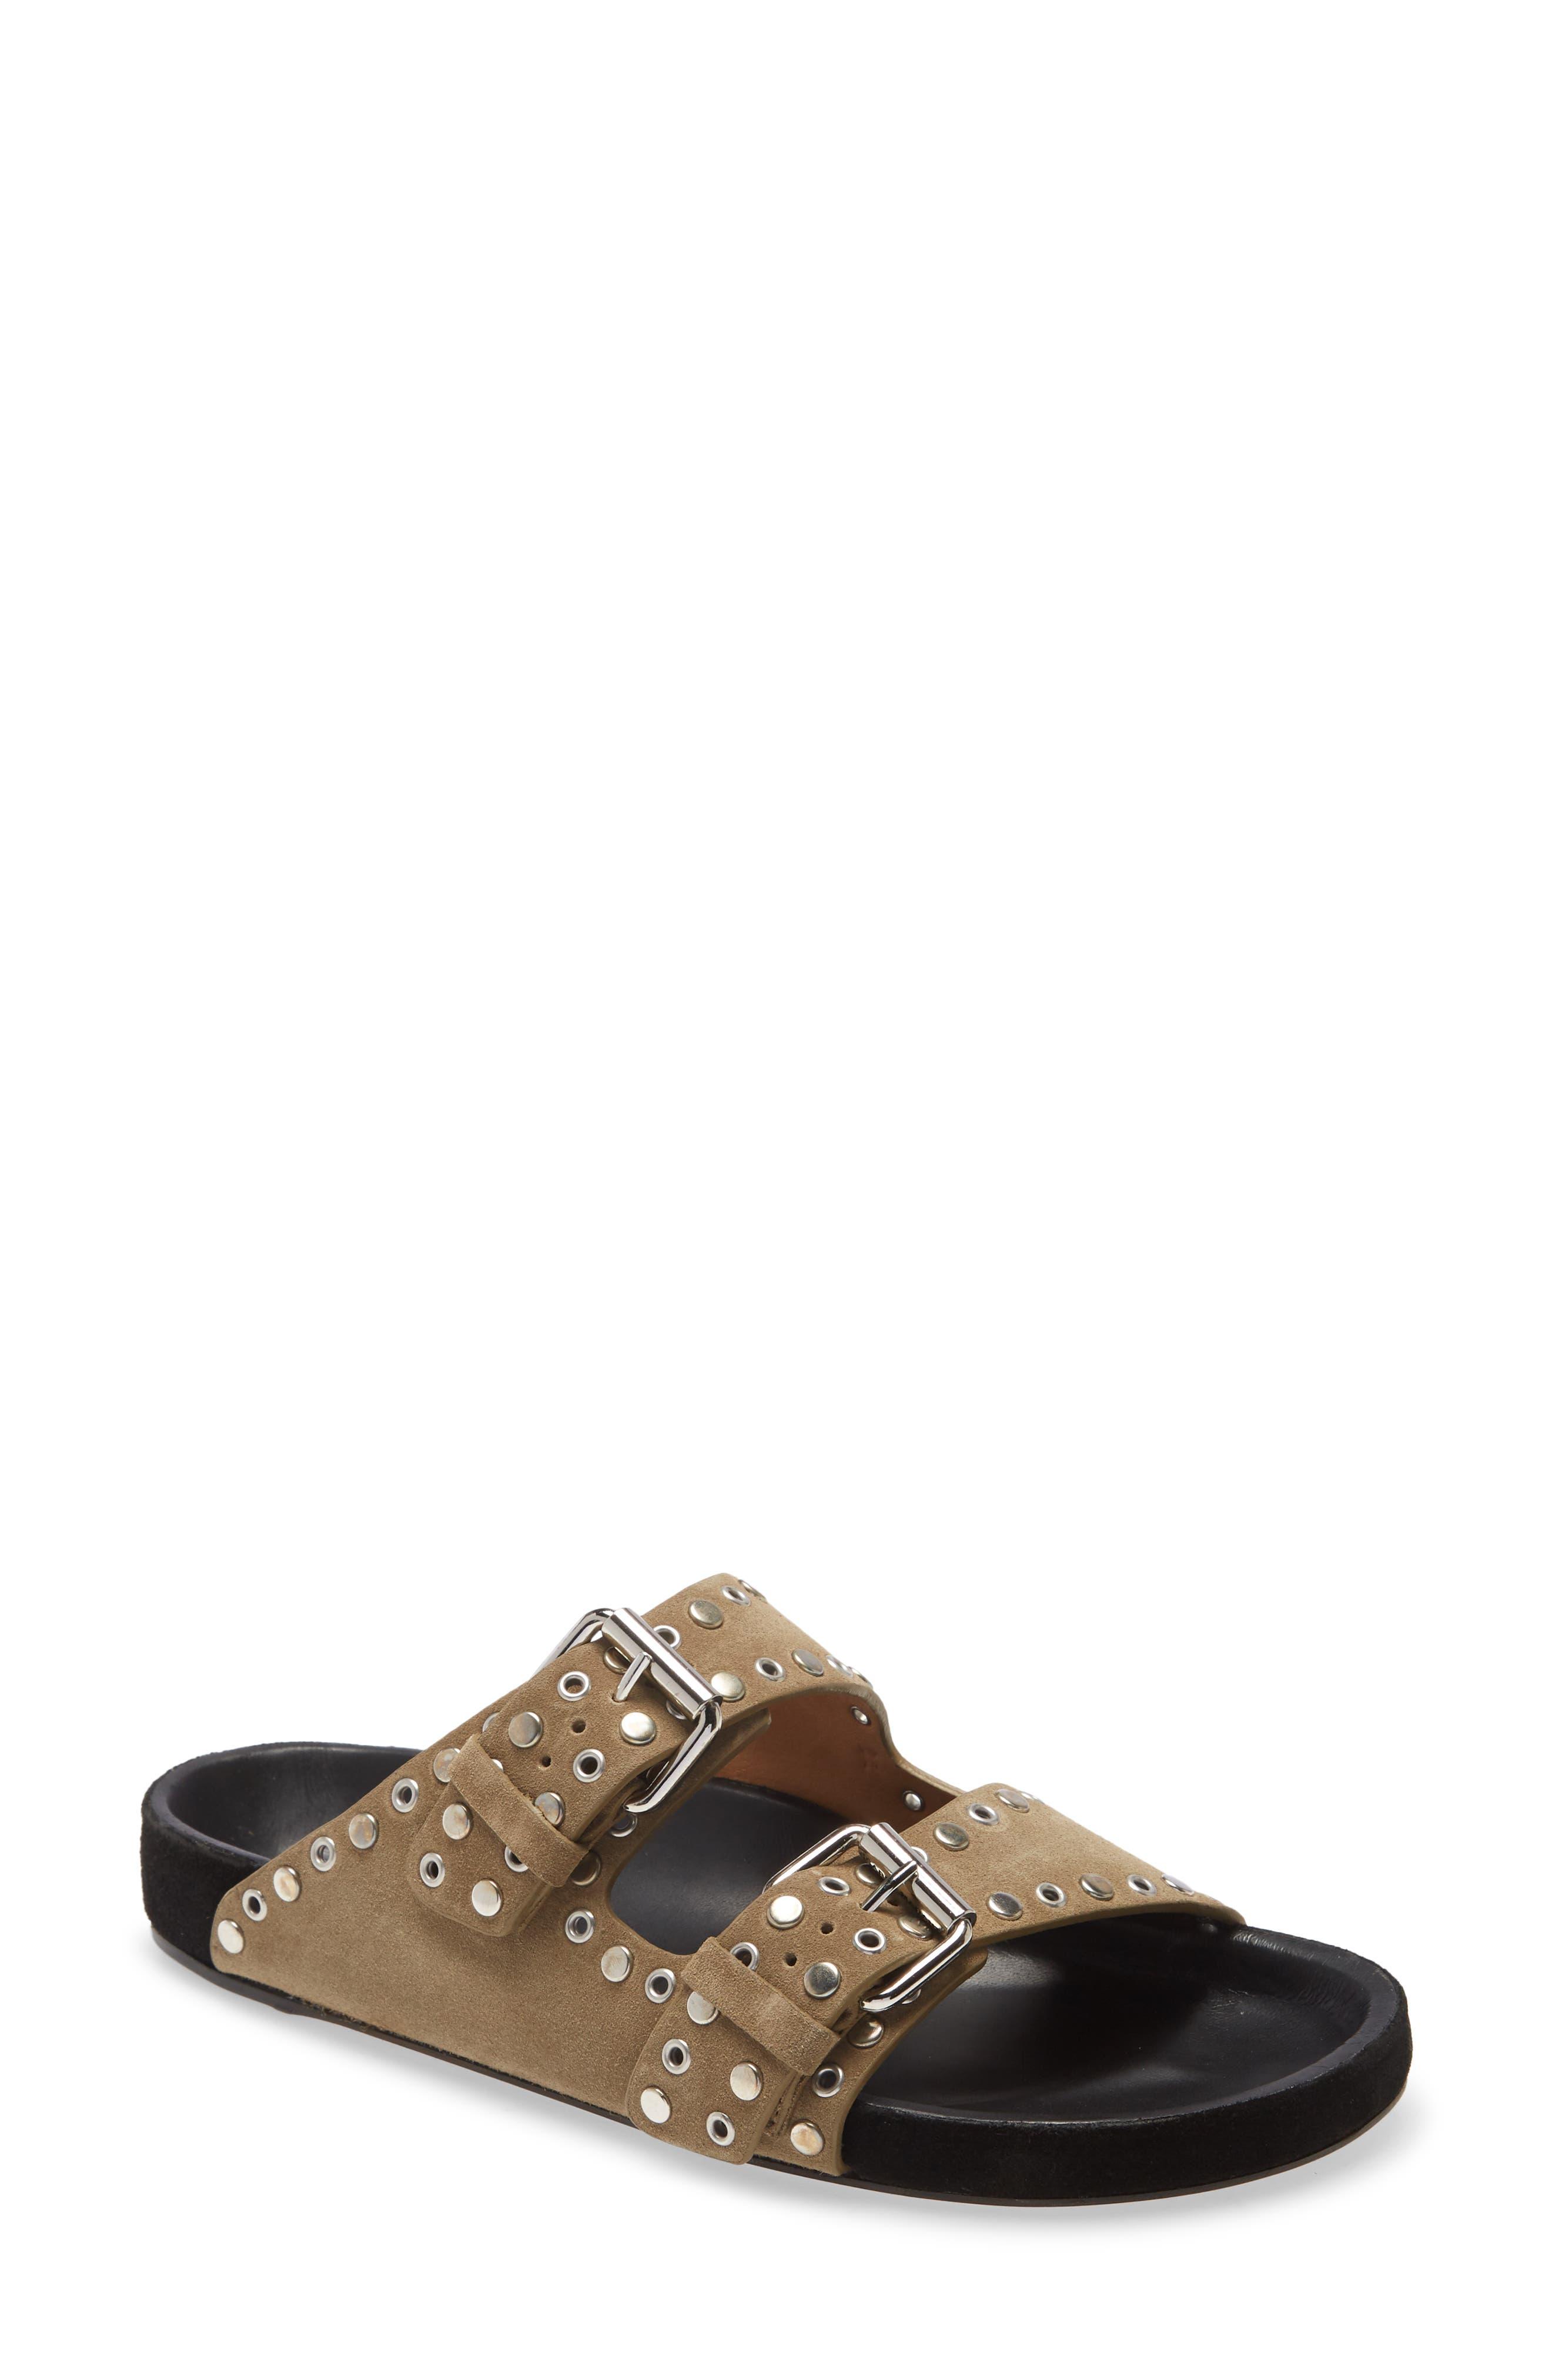 Women's Isabel Marant Sandals and Flip